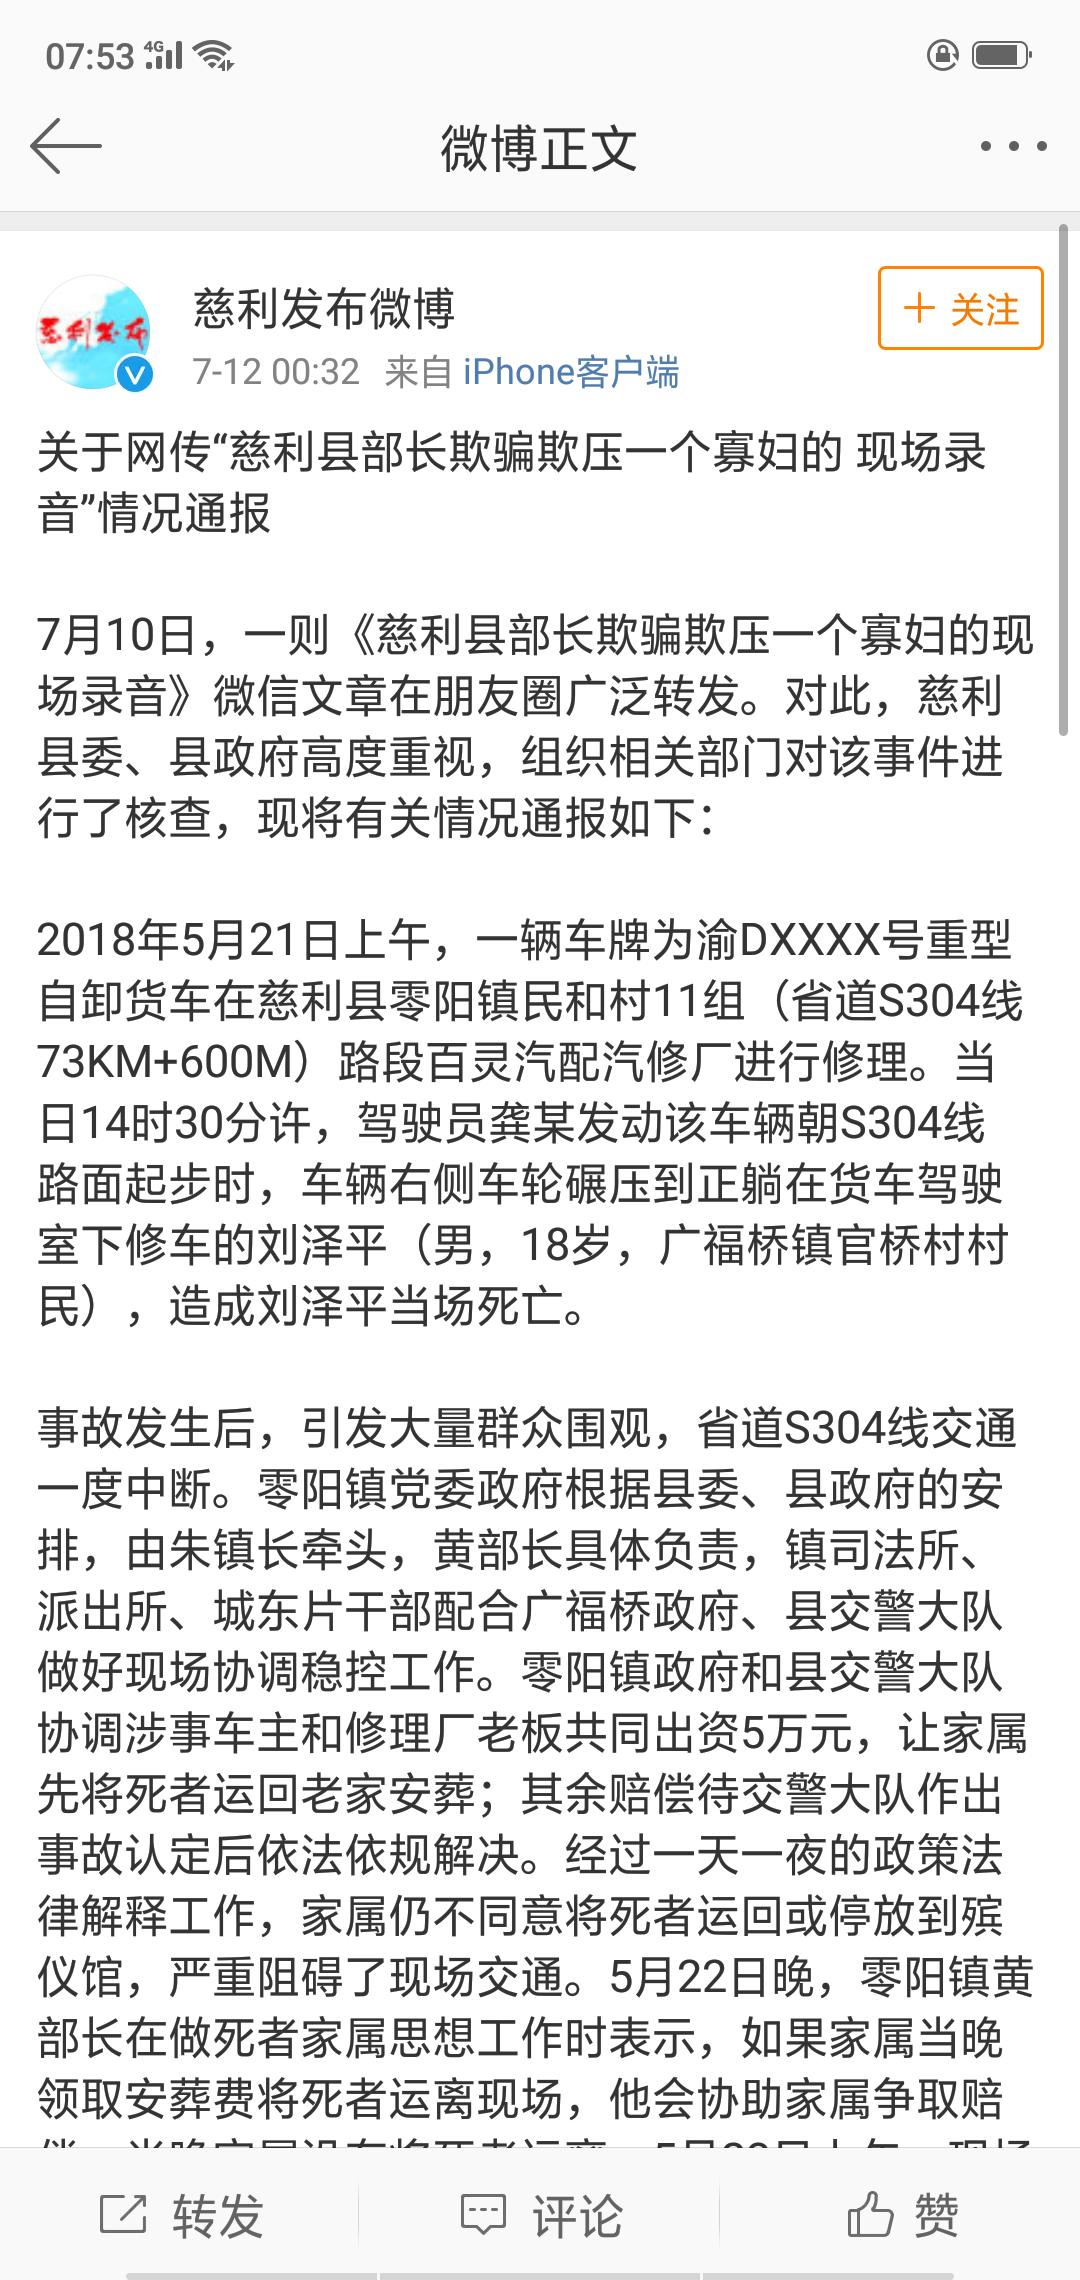 Screenshot_2018-07-12-07-53-32-88.png